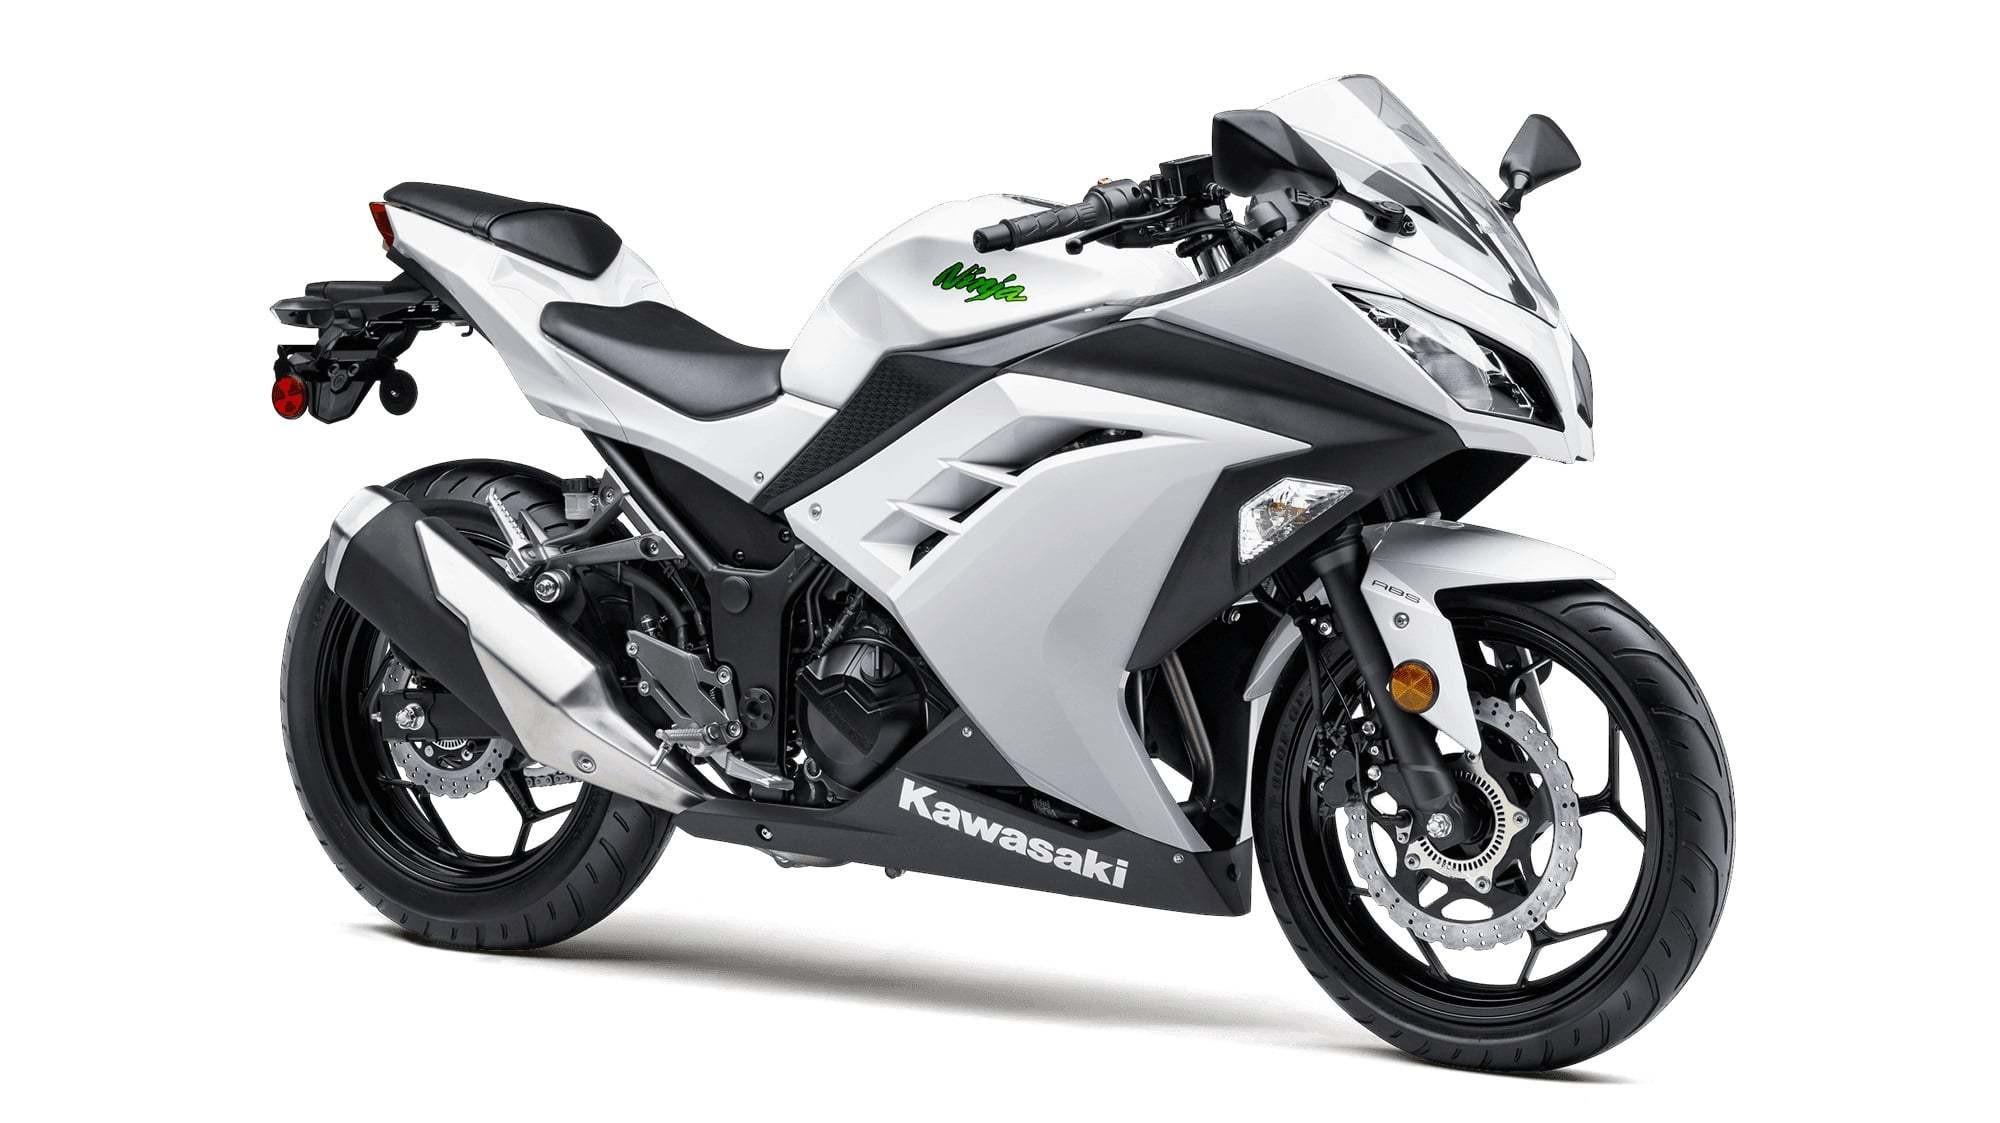 1242x2208 Kawasaki 90 Ide Kawasaki Sepeda Motor Sport Motor Kawasaki Ninja 300